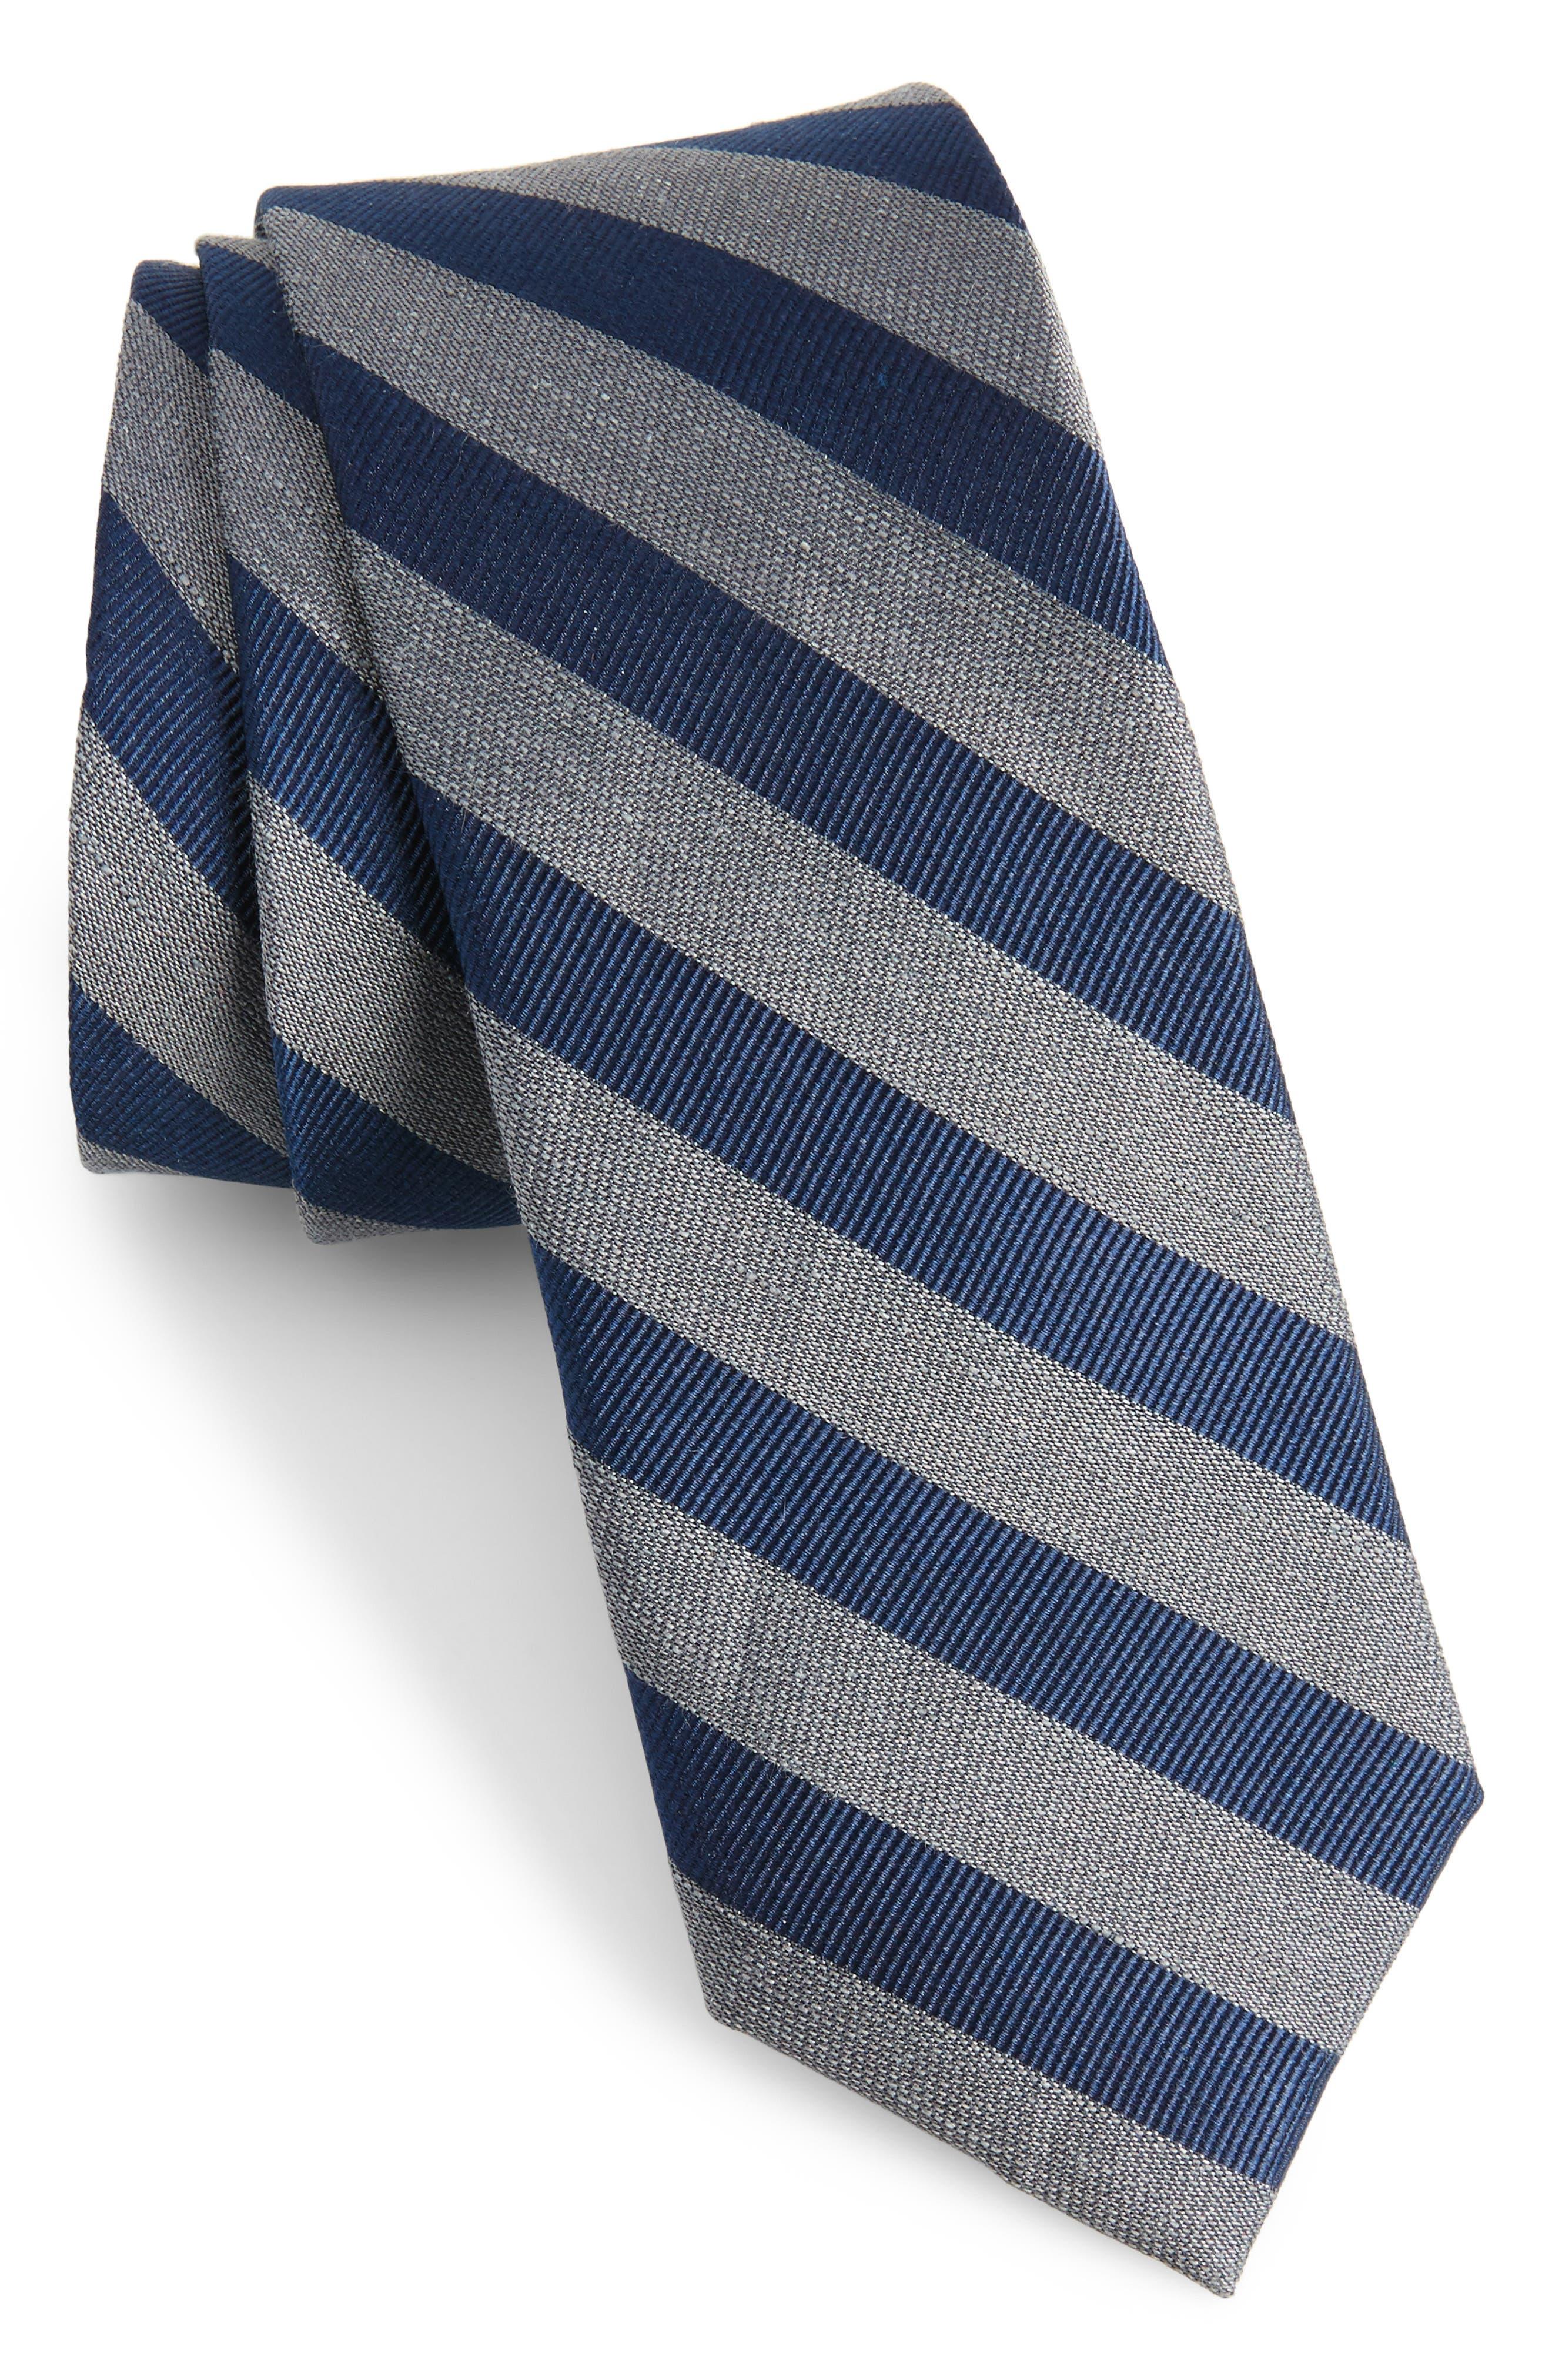 Lumber Stripe Silk & Linen Tie,                         Main,                         color, 030